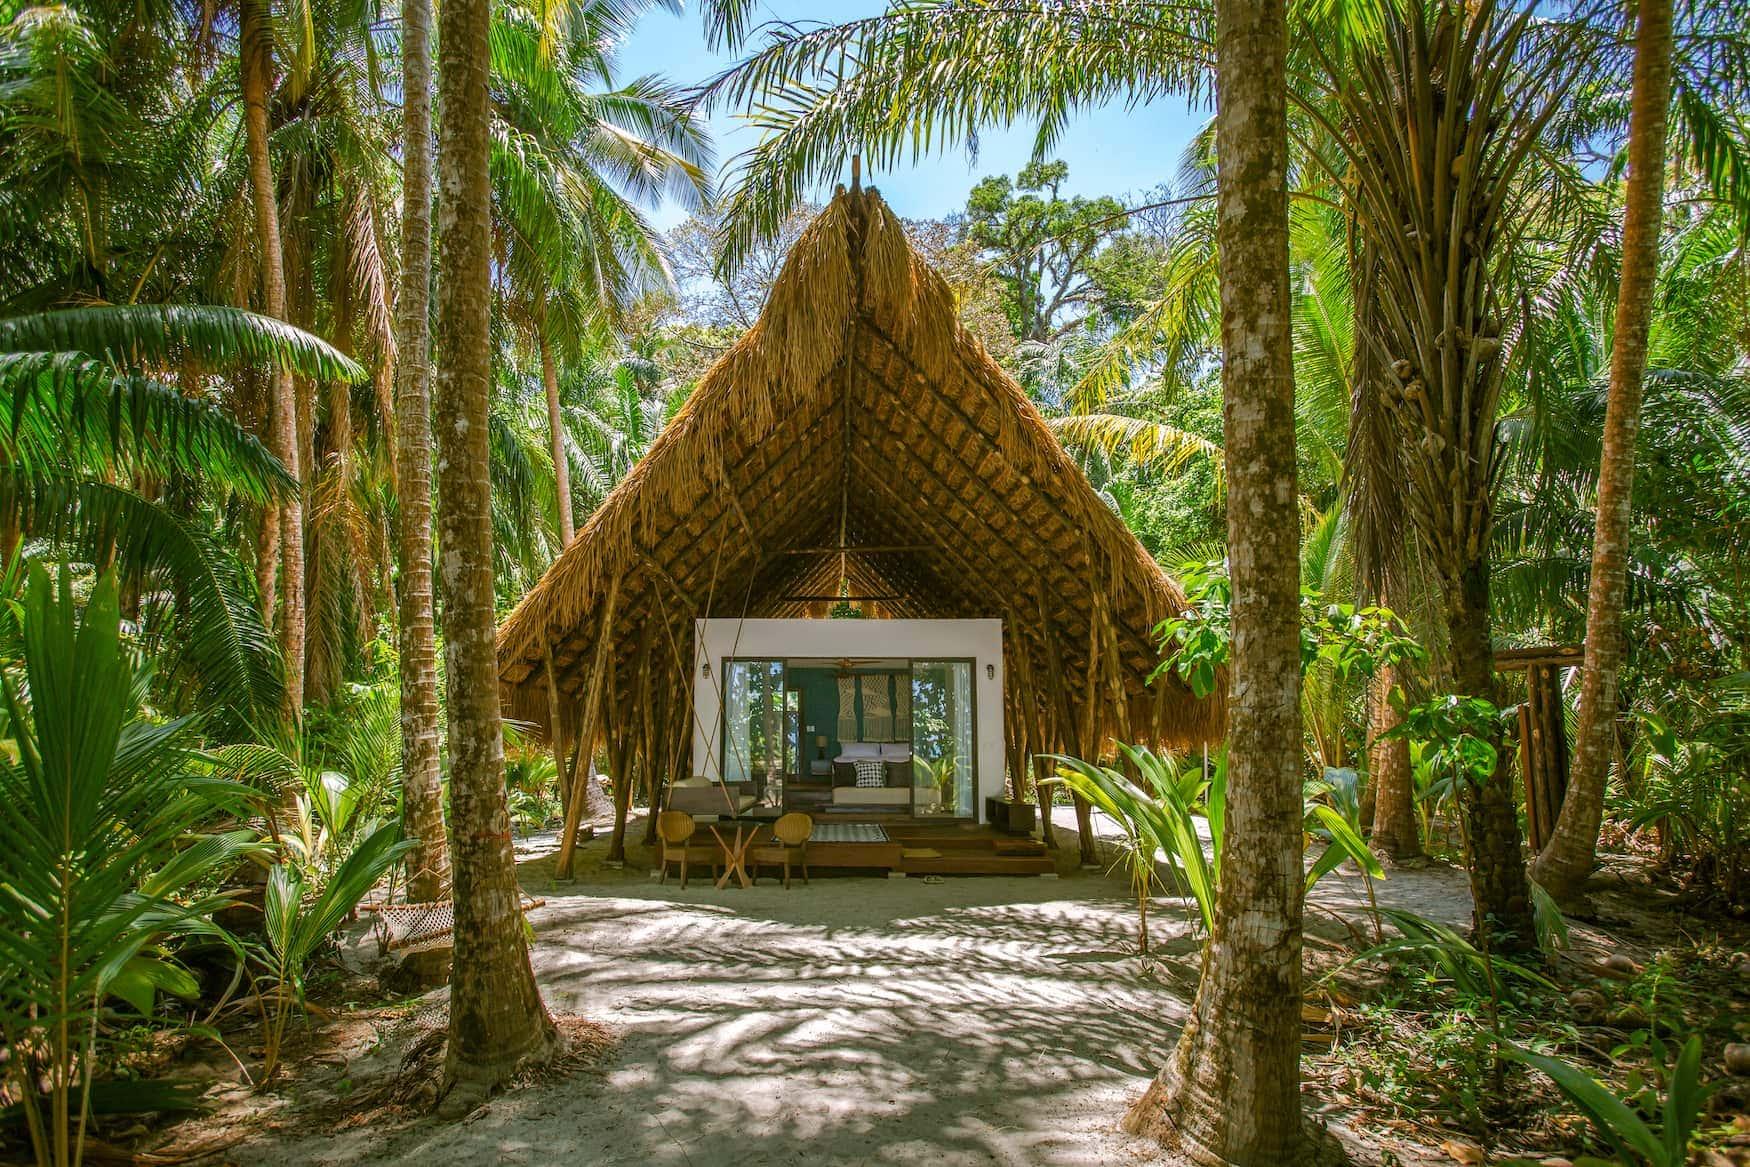 Sztandcasita auf Isla Palenque in Panama